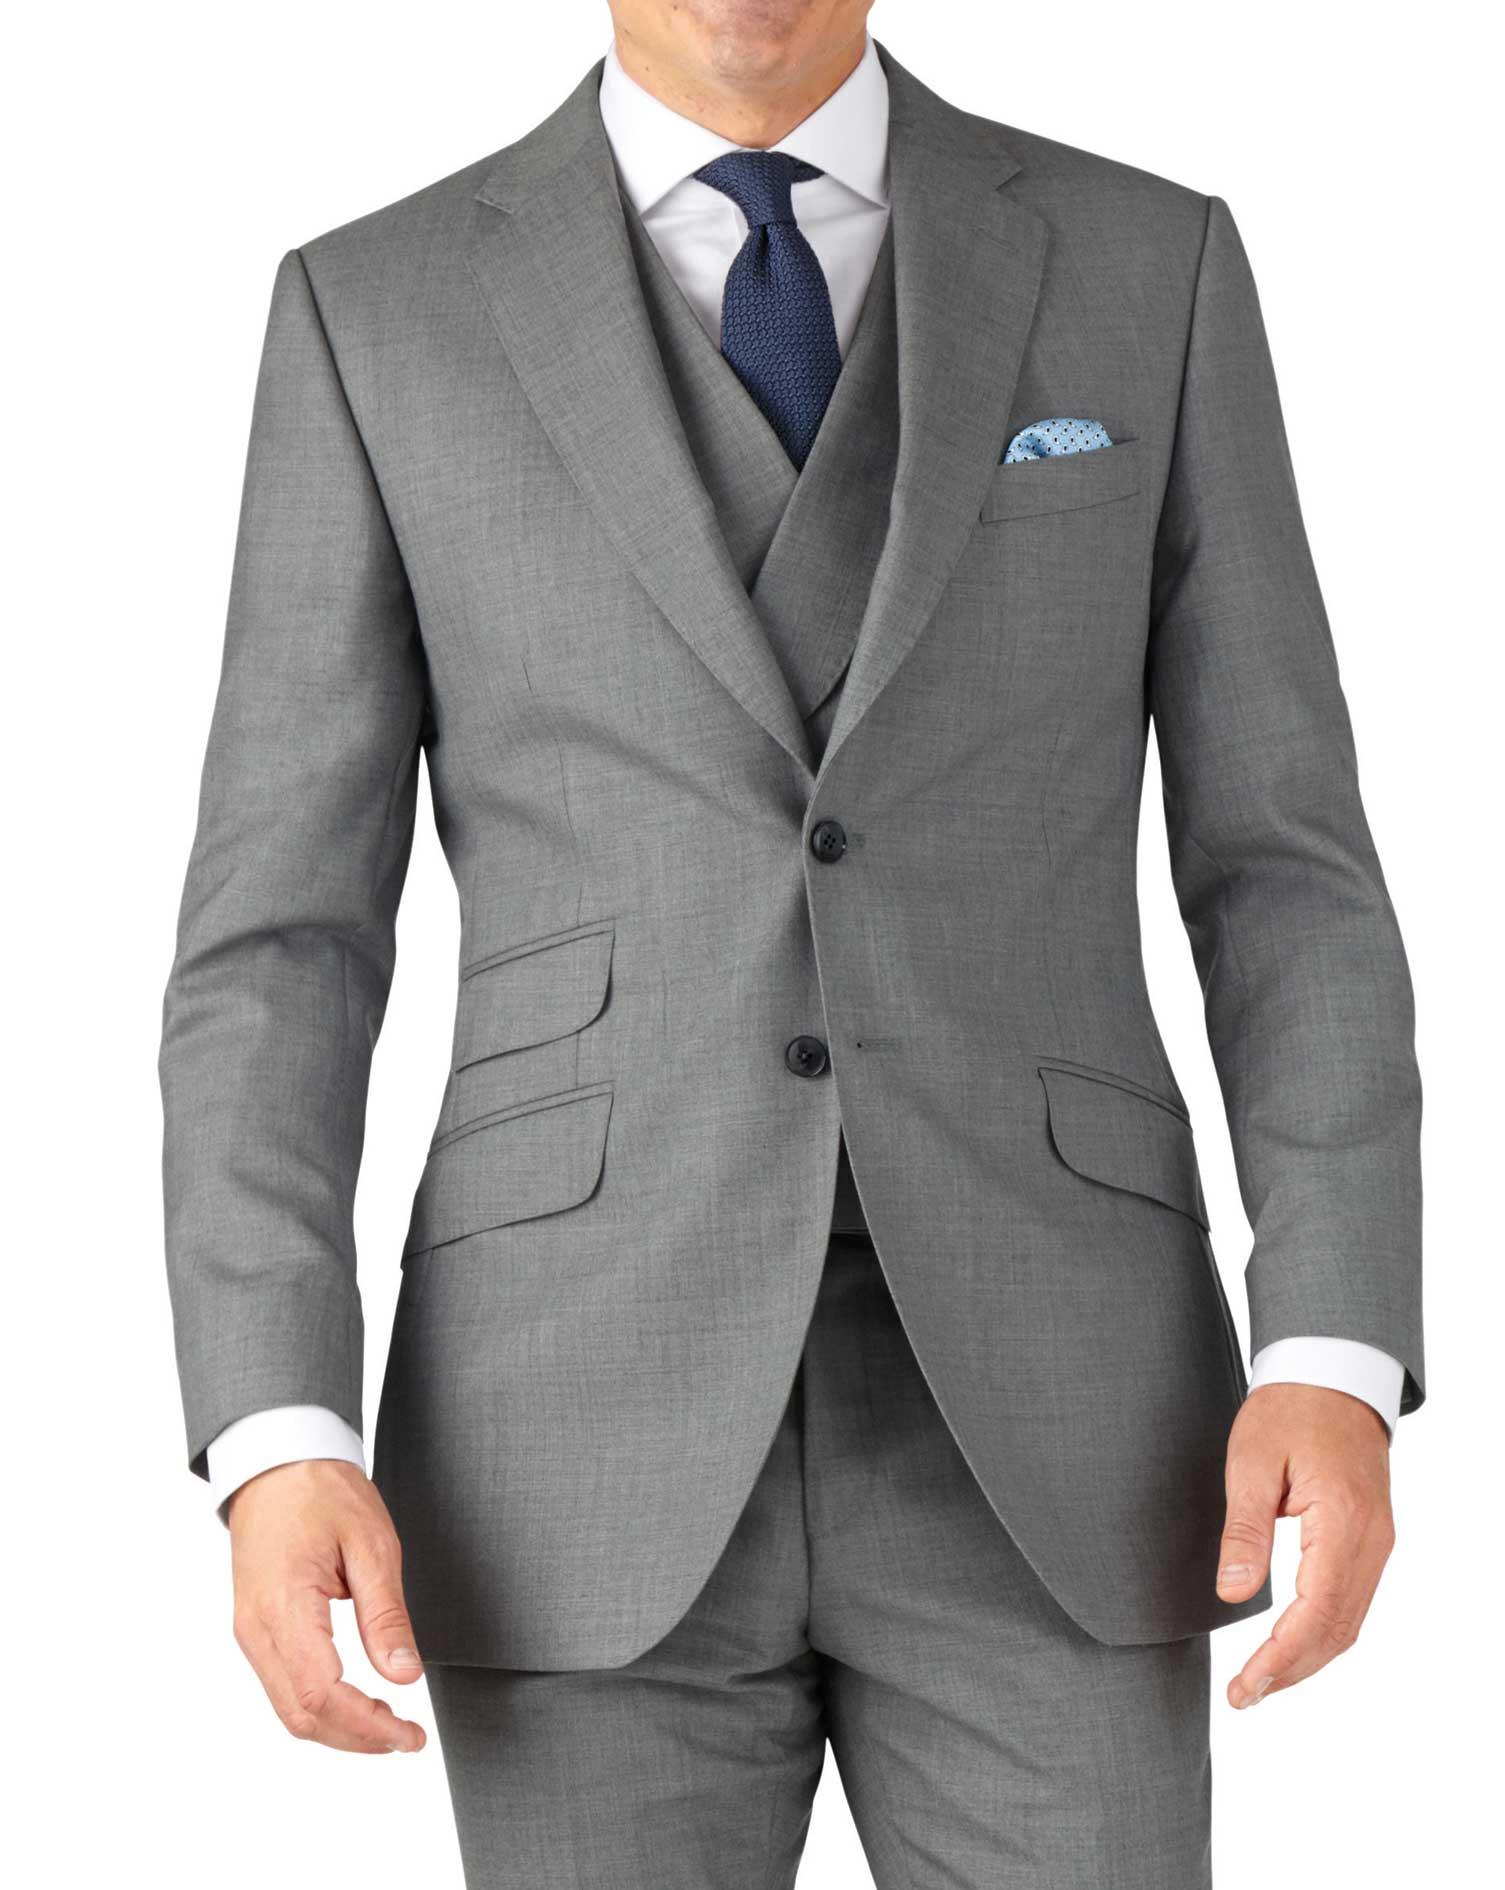 Silver Slim Fit British Panama Luxury Suit Wool Jacket Size 40 Short by Charles Tyrwhitt